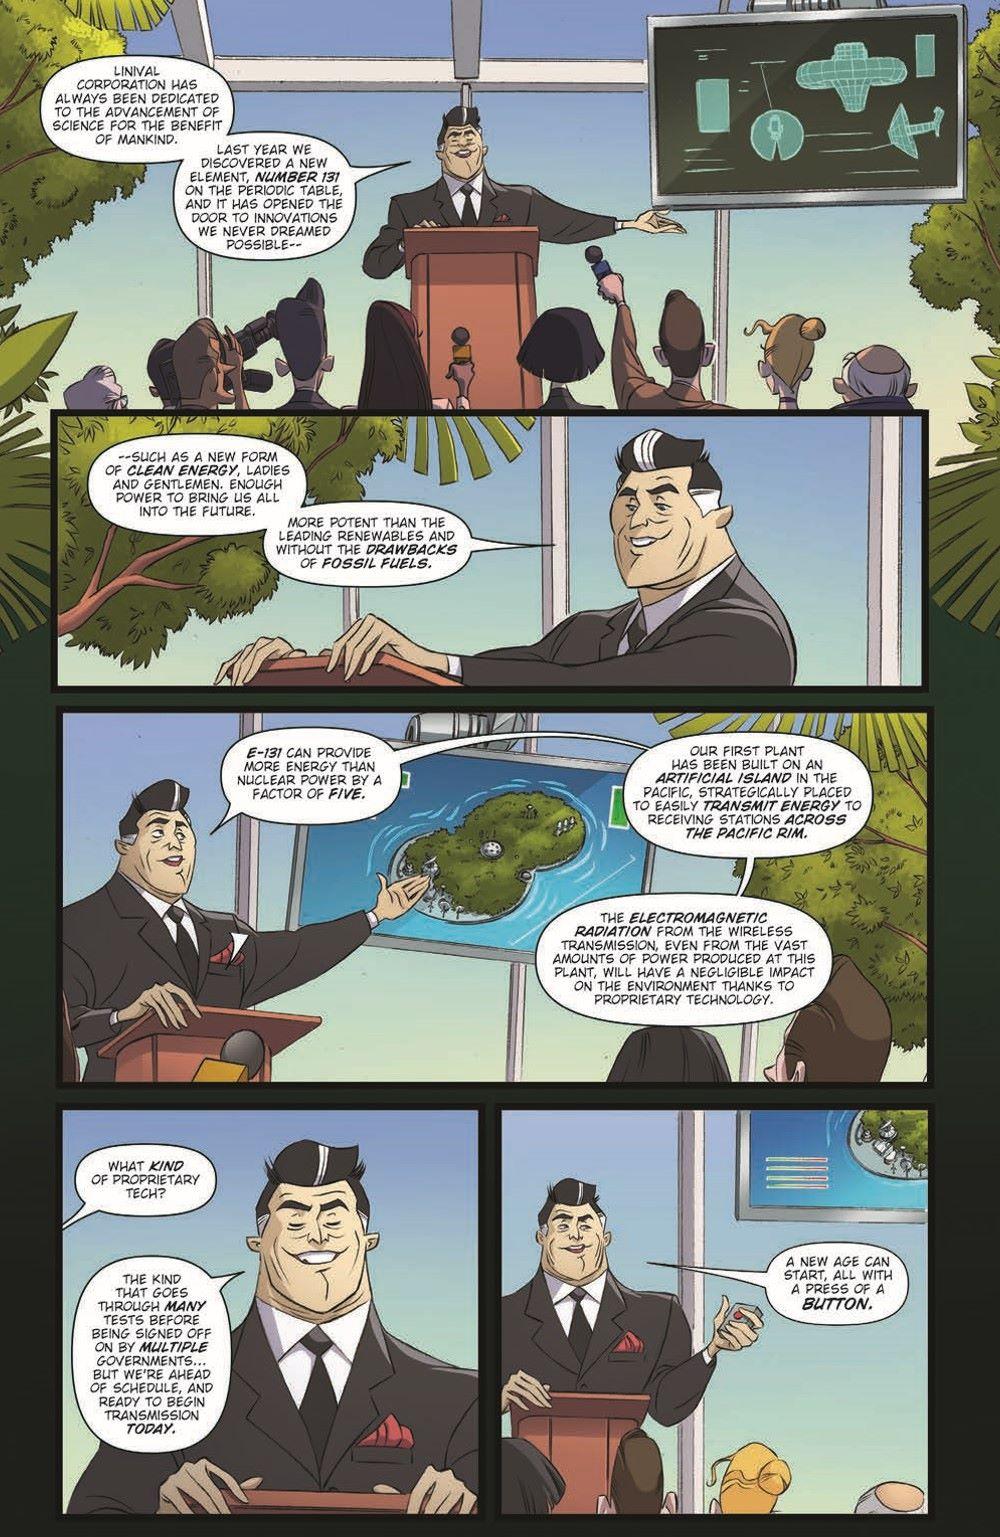 Godzilla_MnP_01_pr-7 ComicList Previews: GODZILLA MONSTERS AND PROTECTORS #1 (OF 5)